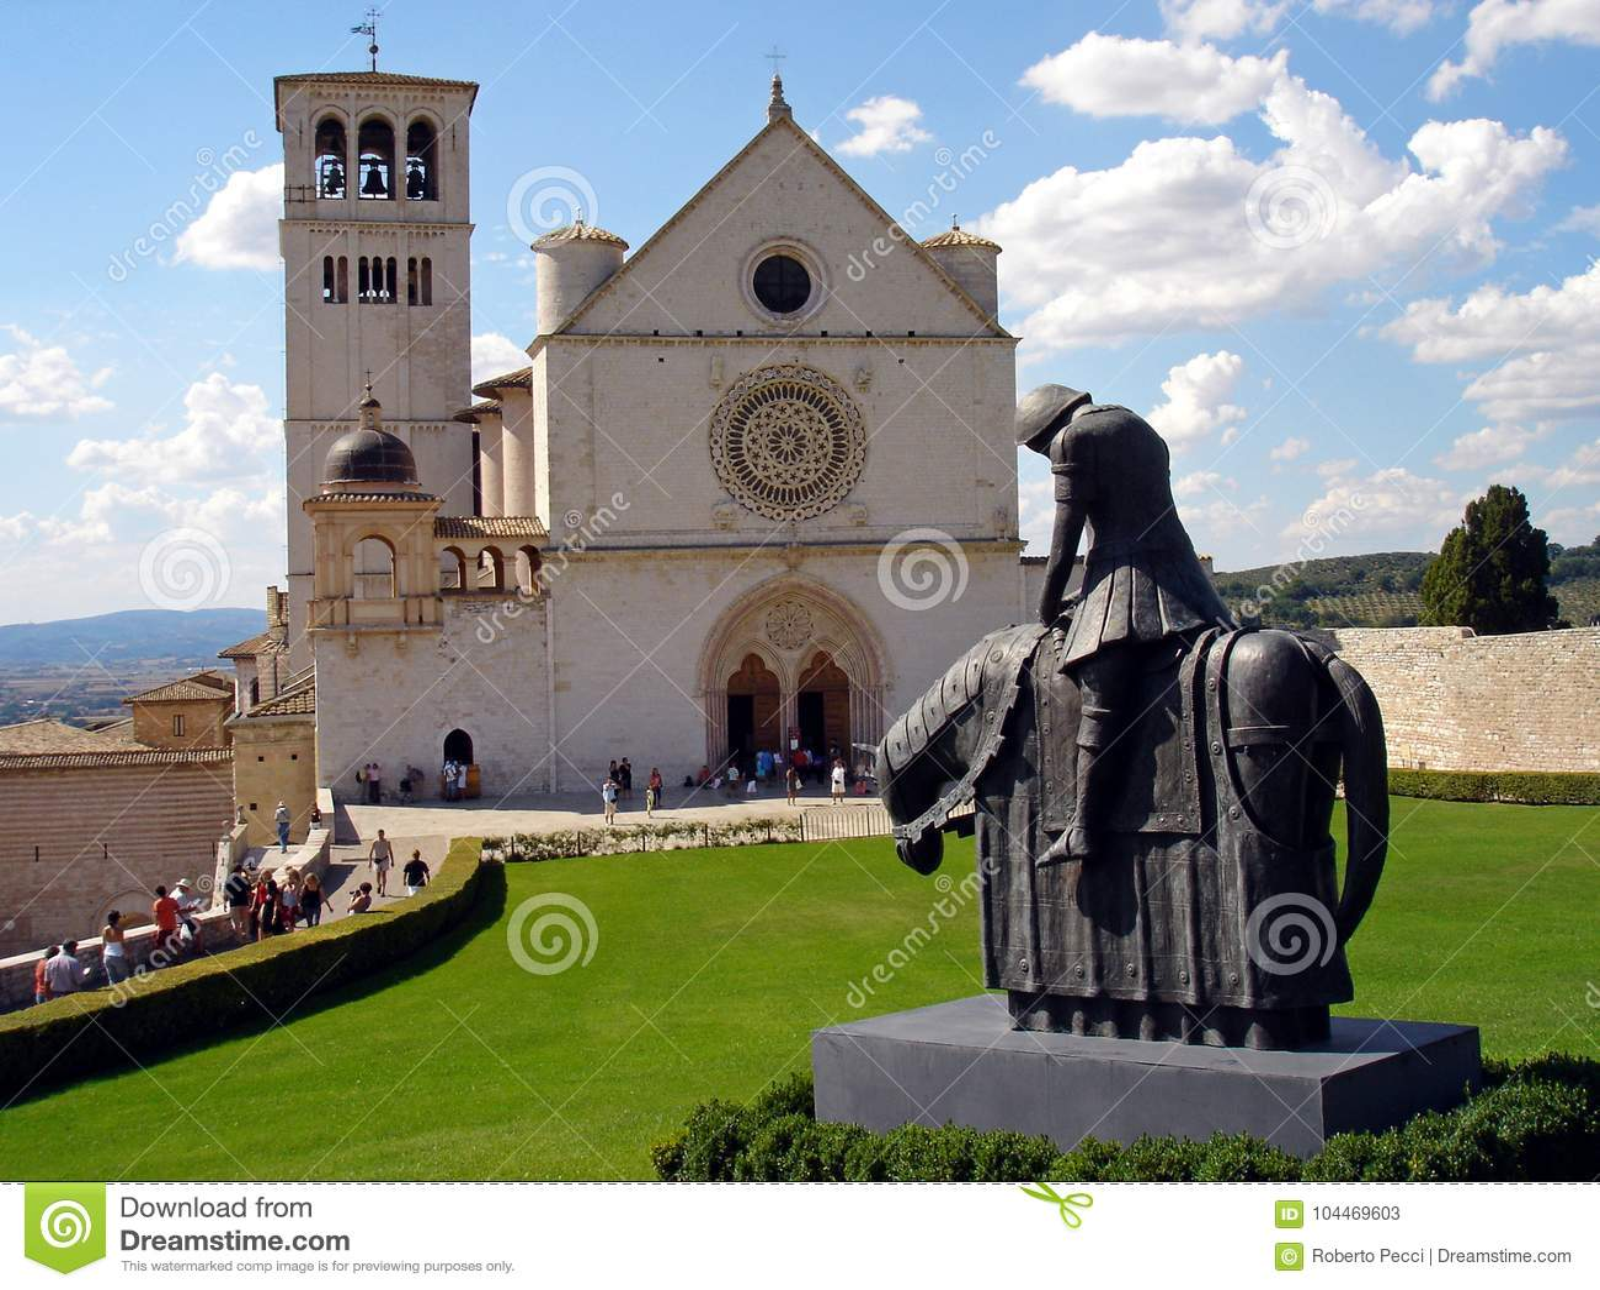 Италия, Умбрия, 28-ое августа 2008, посещение к городу Assisi, взгляд базилики Сан Francesco